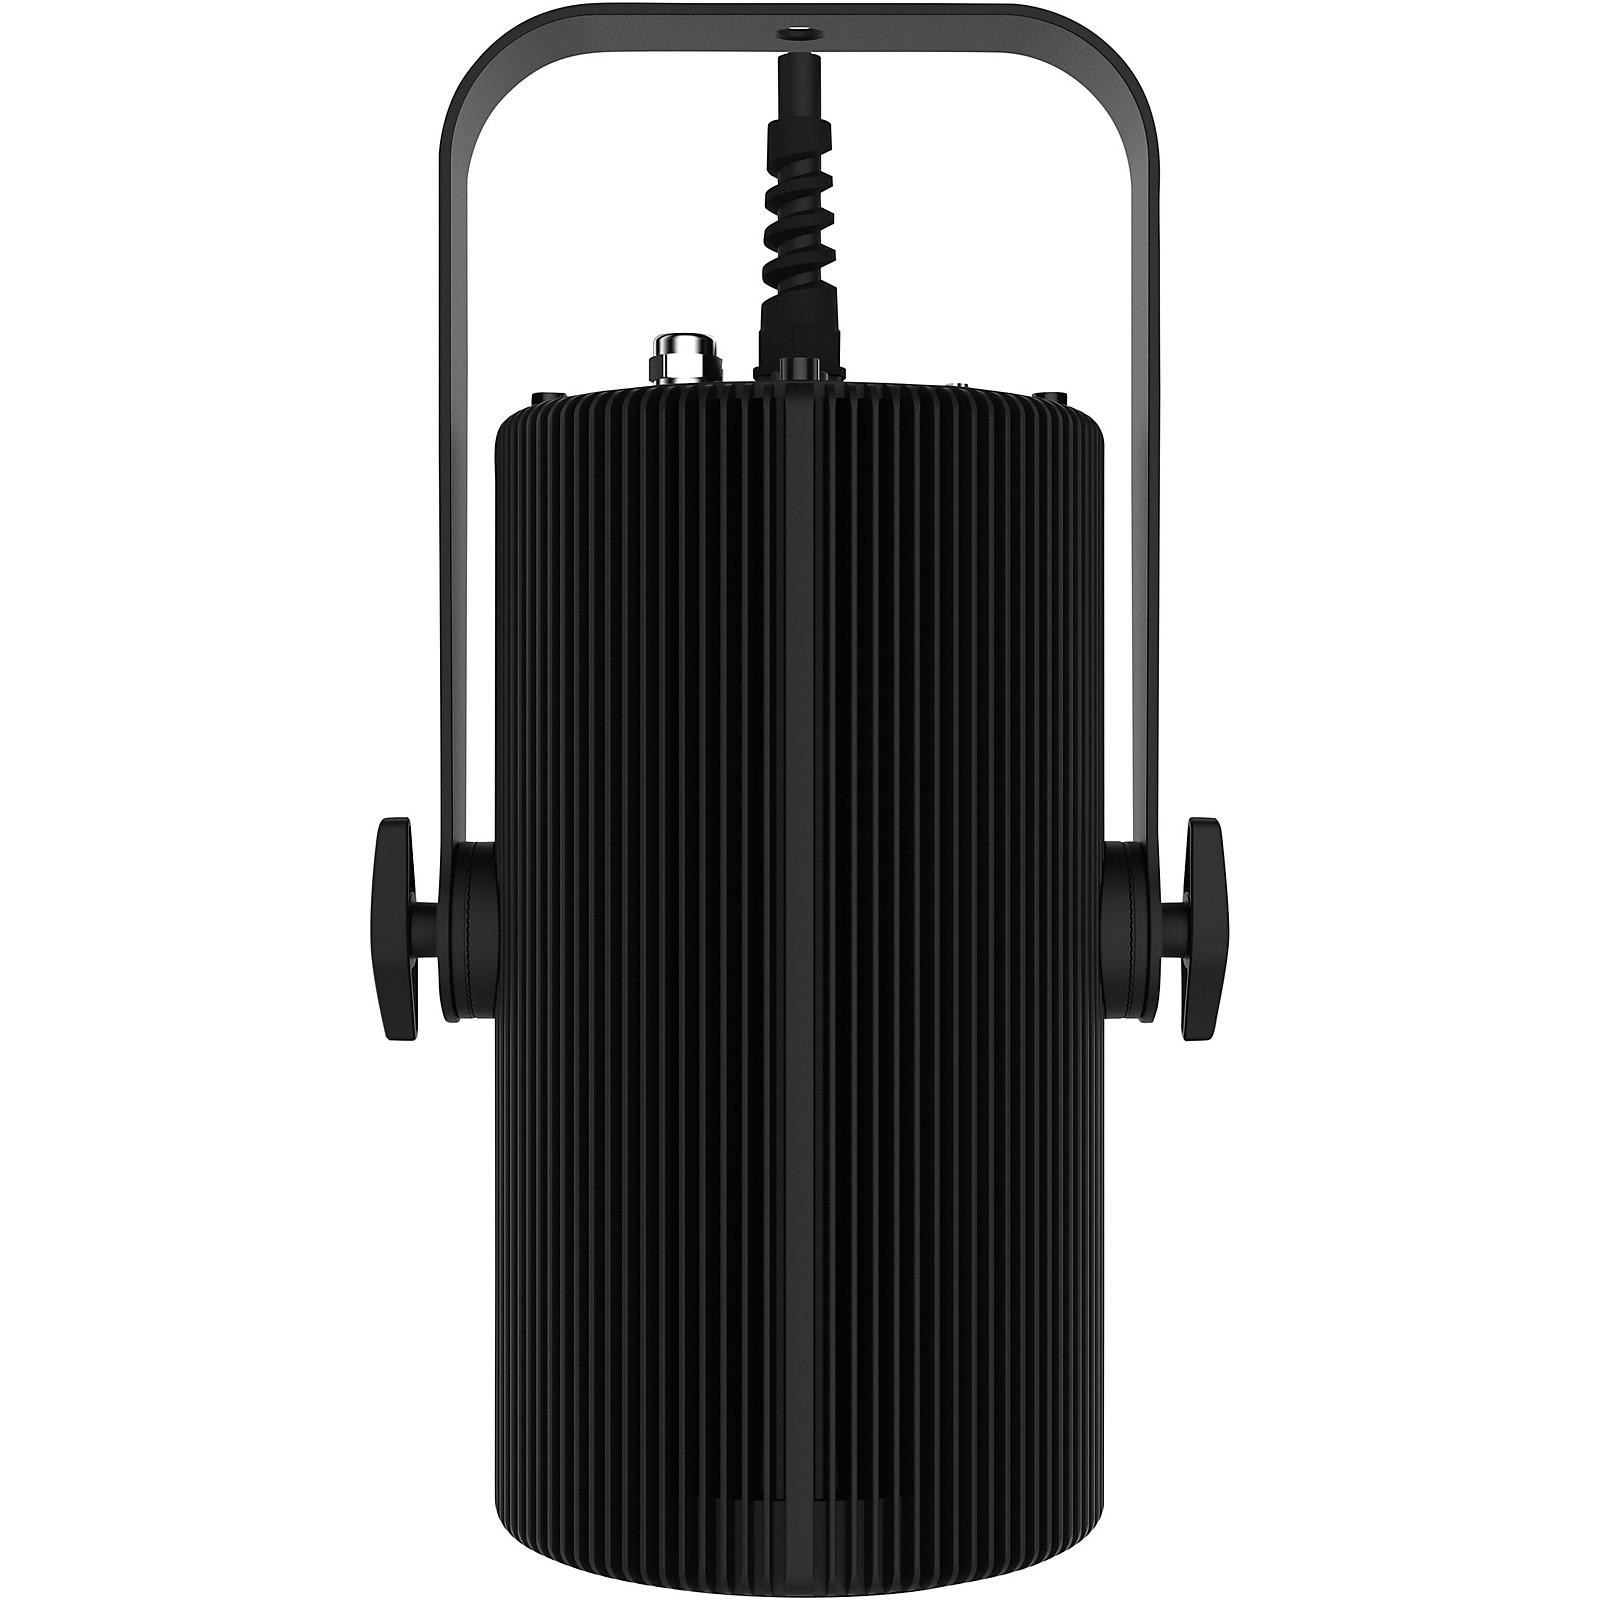 CHAUVET Professional Ovation H-605FC LED Light